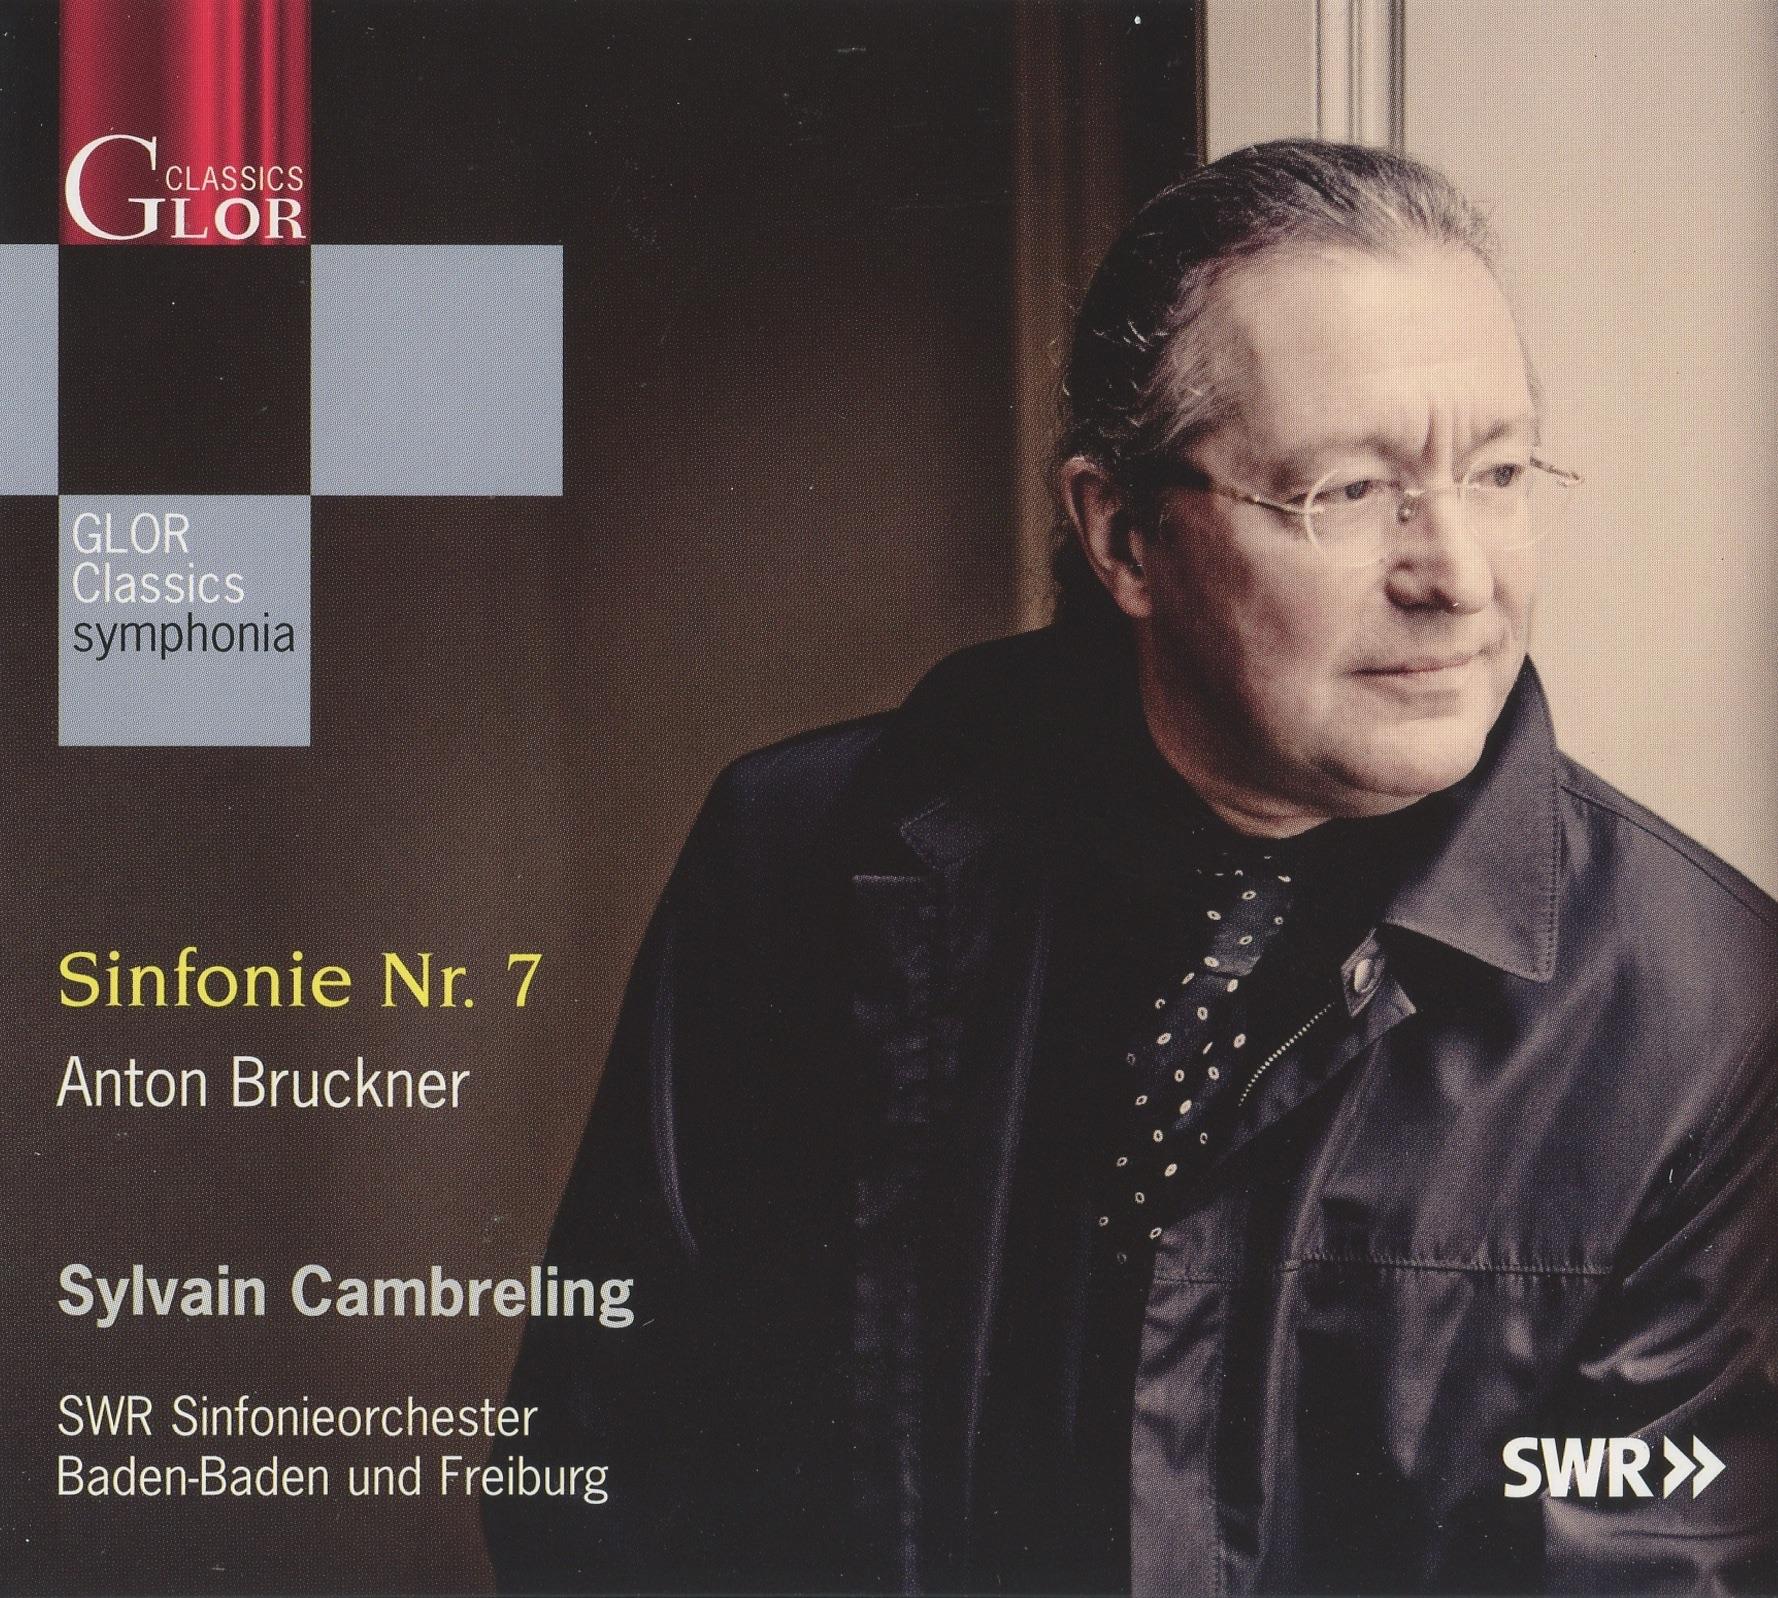 Symphony No. 7 in E major, WAB 107 (1885 version, ed. L. Nowak): IV. Finale: Bewegt, doch nicht schnell